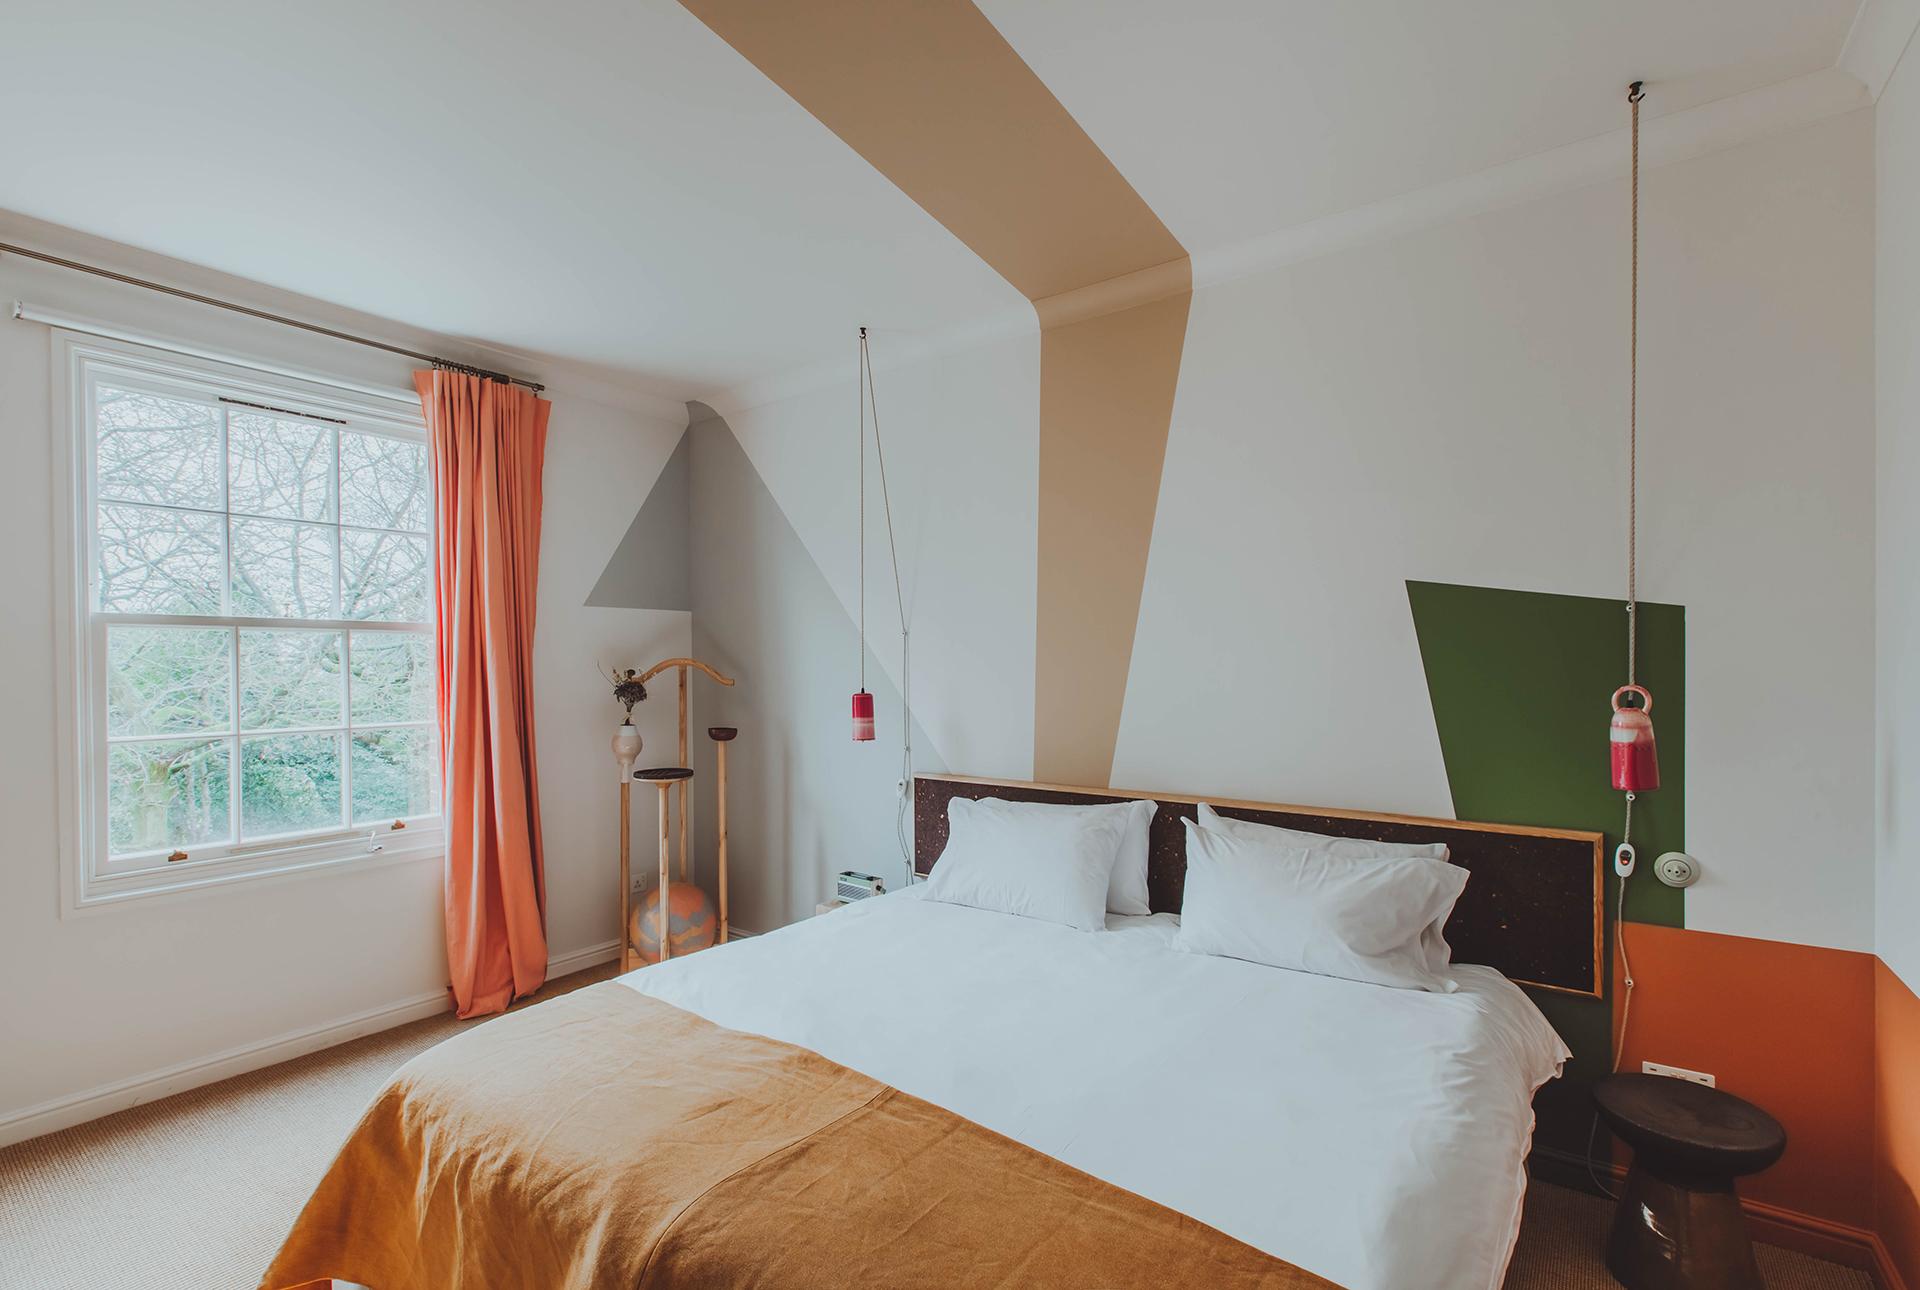 Guest room. Photo by Adam Firman.